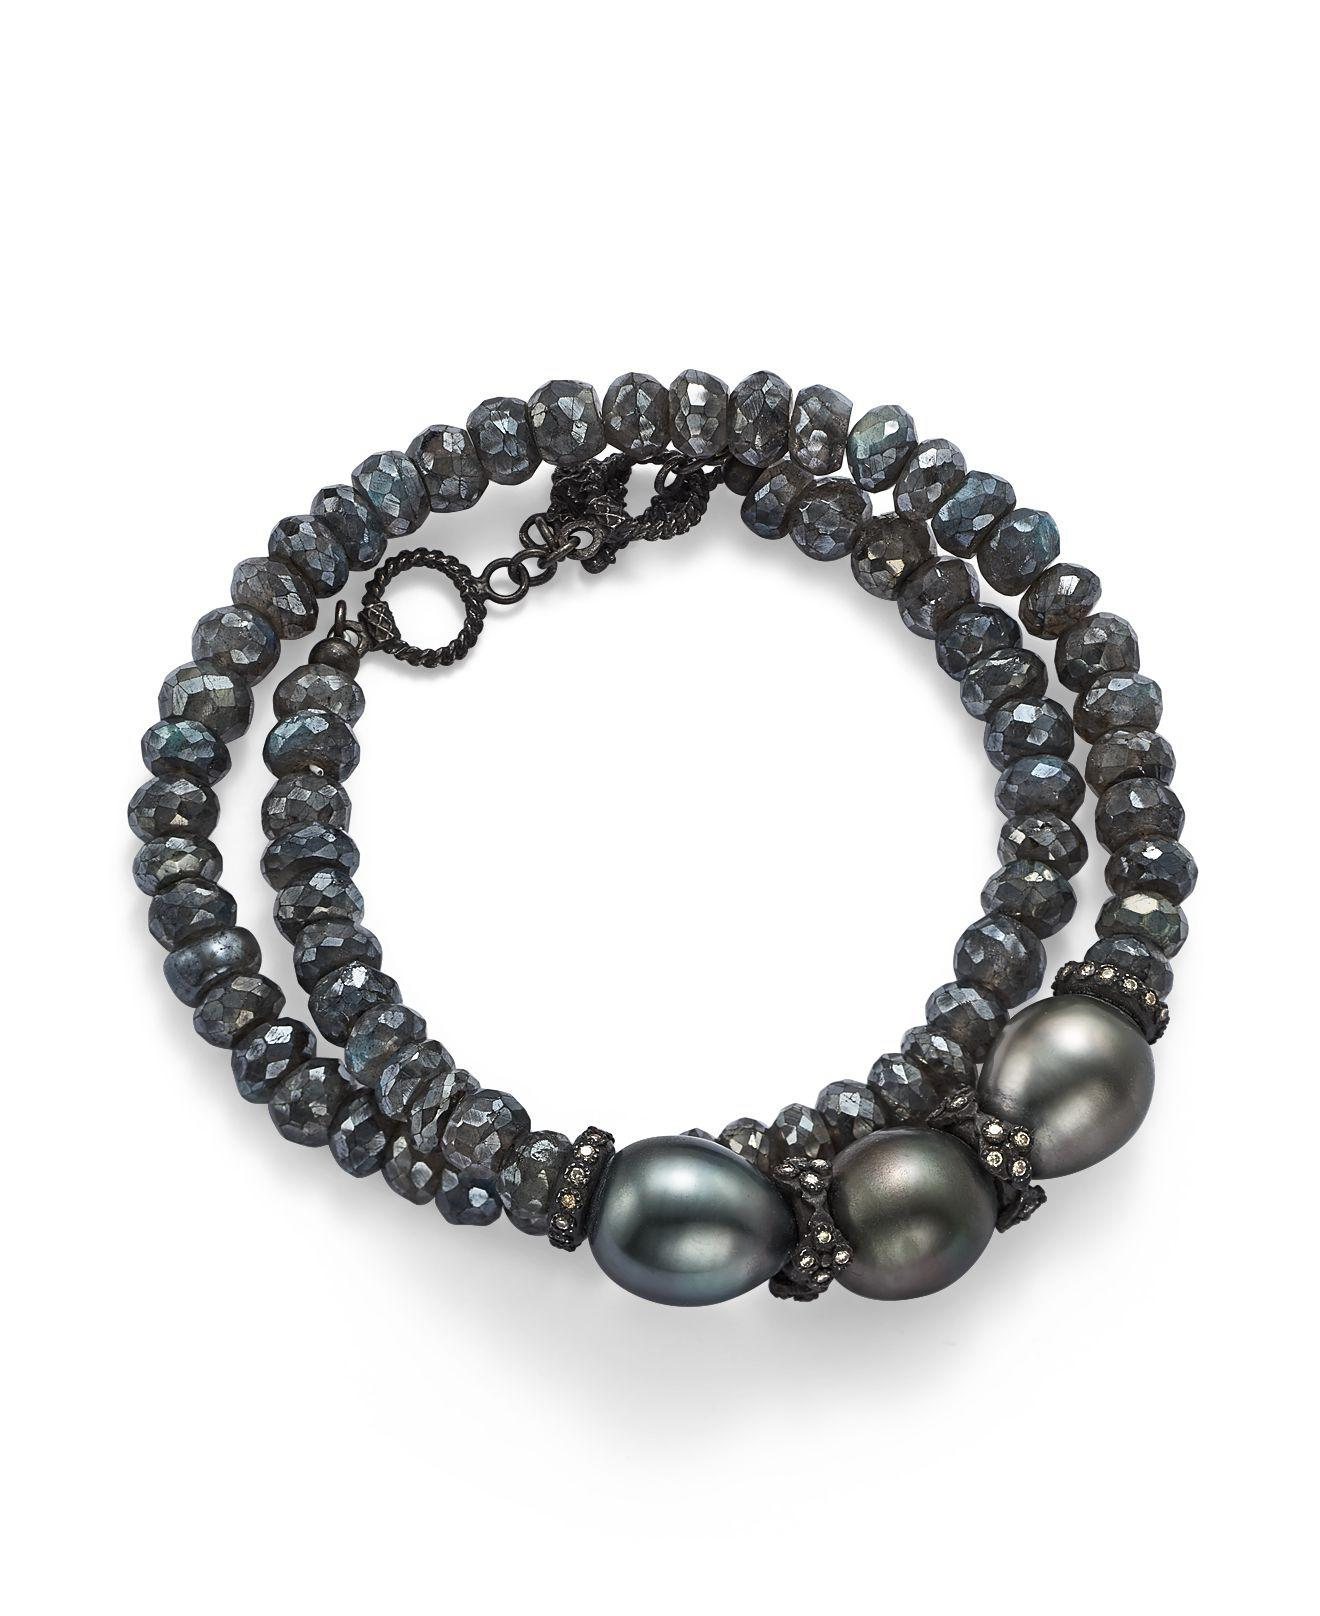 Armenta Old World Tahitian Pearl Pull-Cord Bracelet with Champagne Diamonds 5zL1kDuTk9